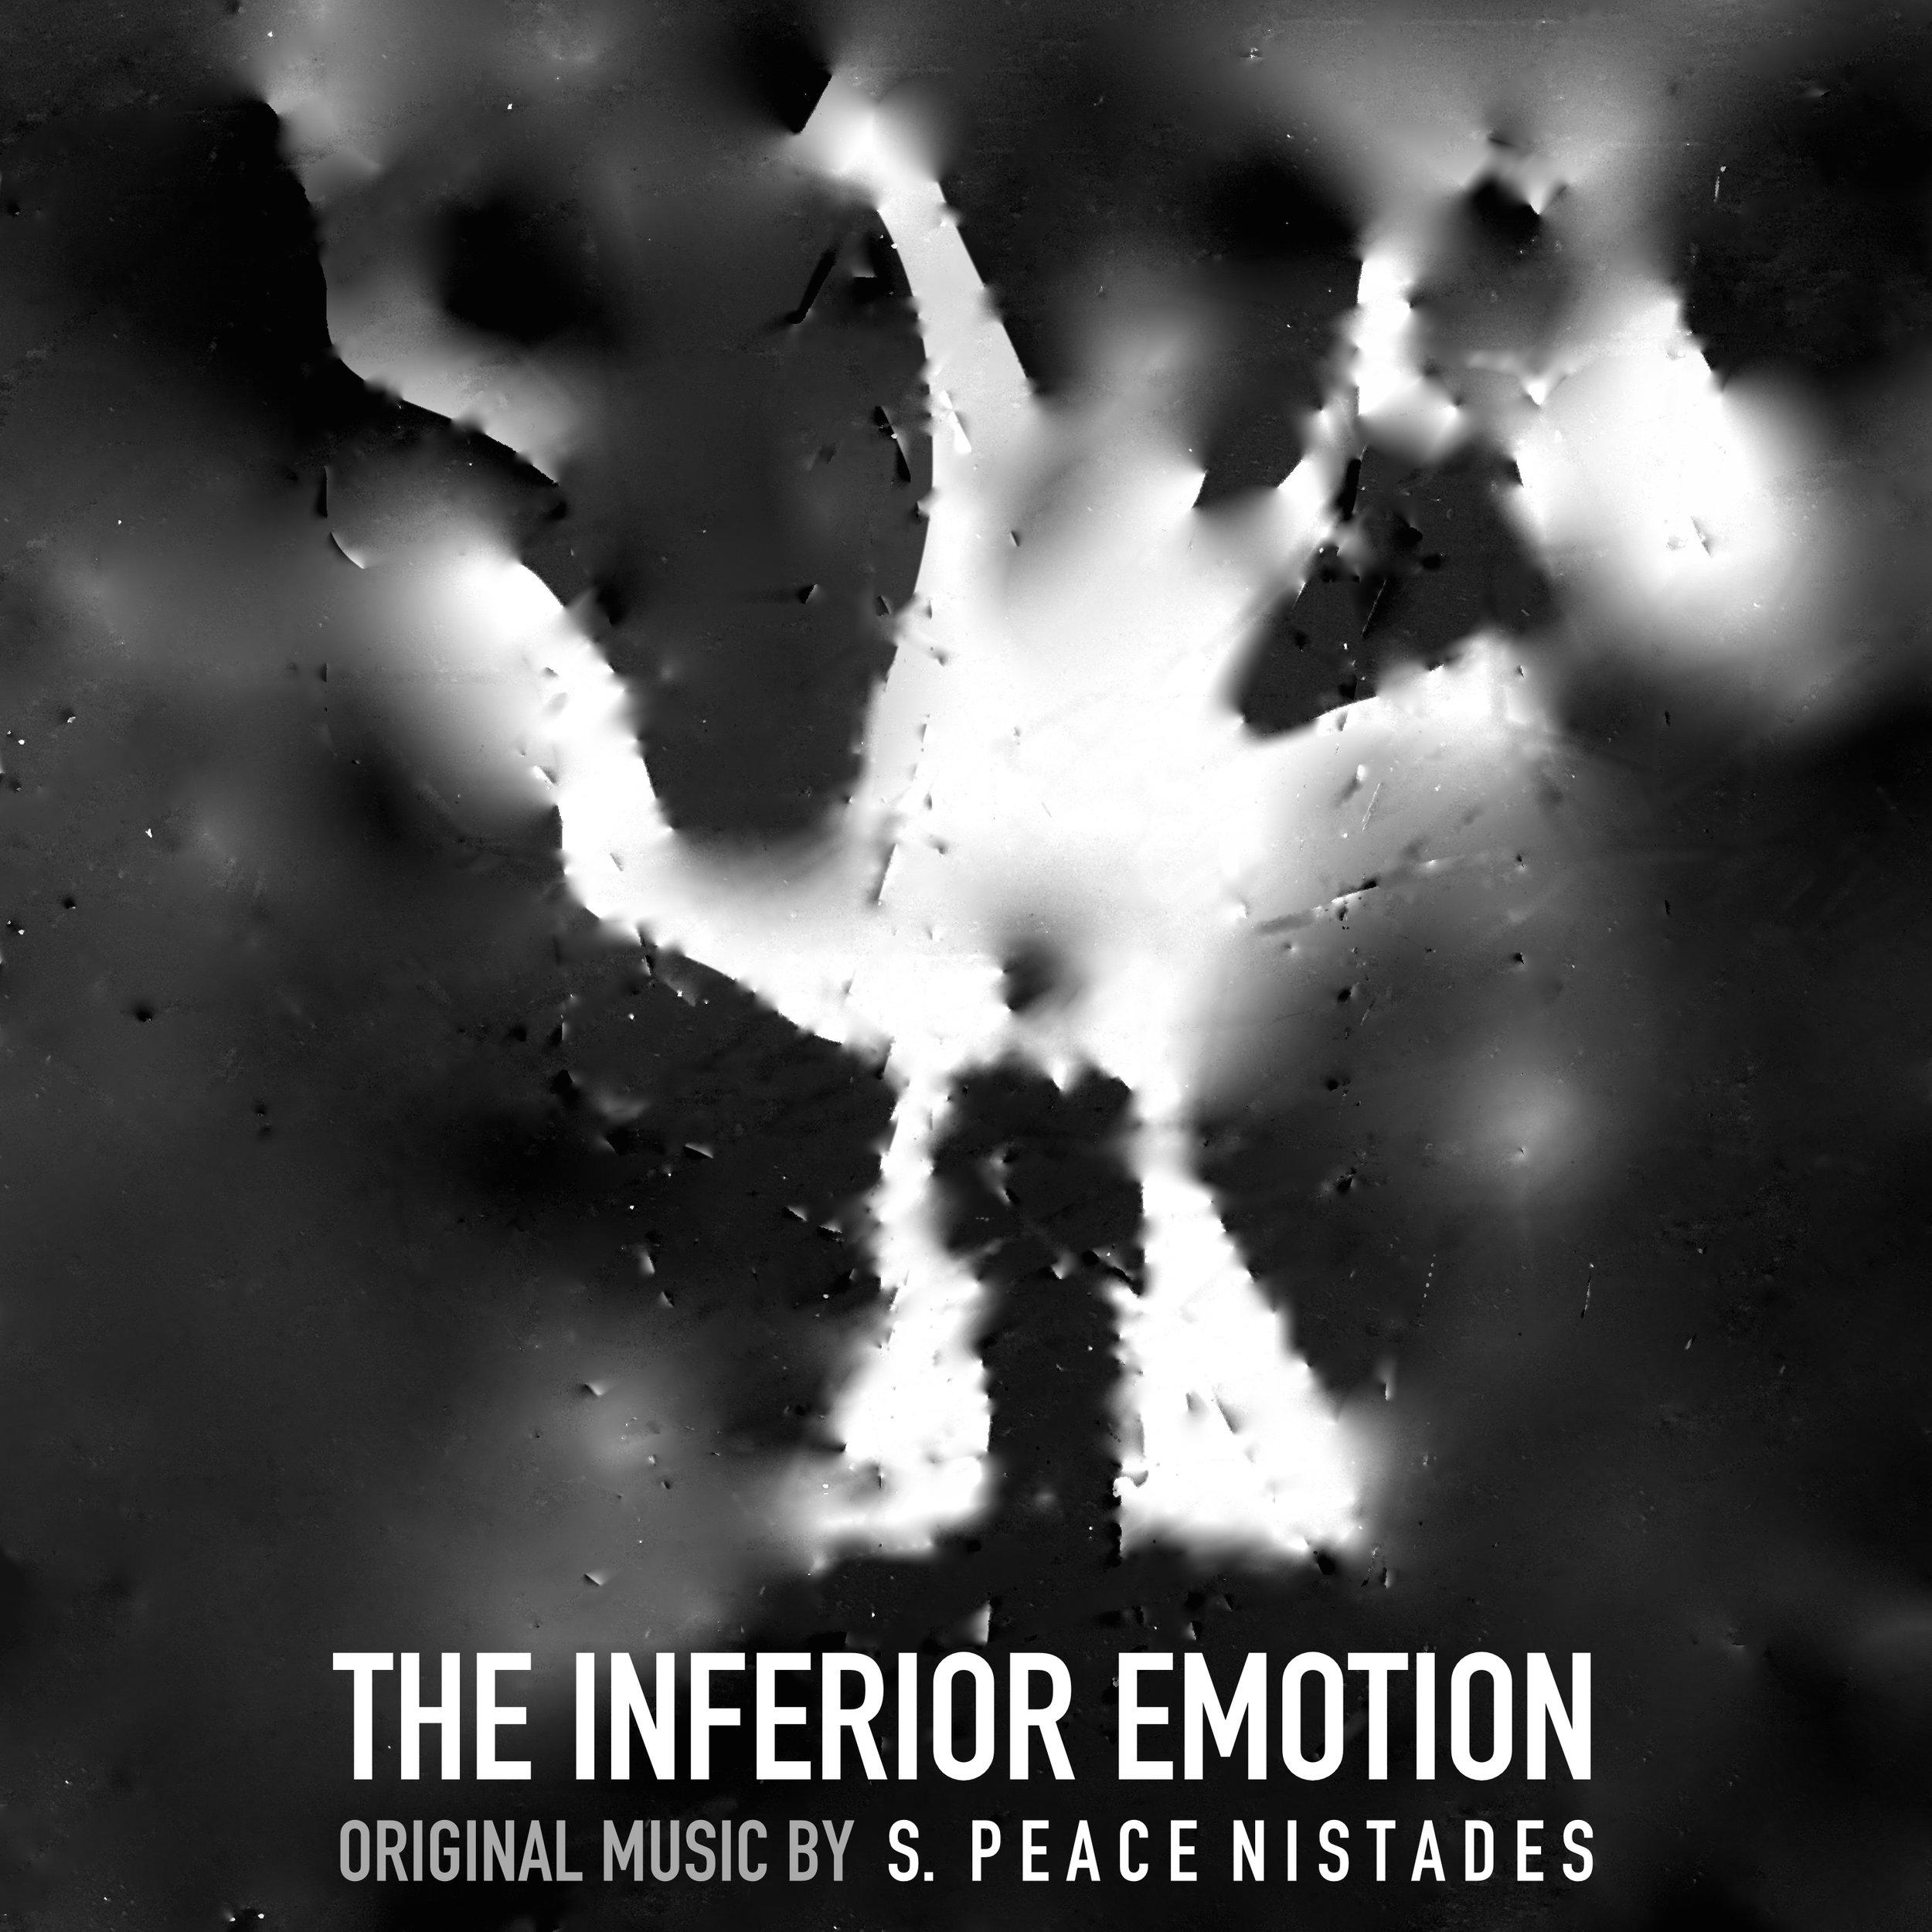 THE INFERIOR EMOTION Album Cover.jpg